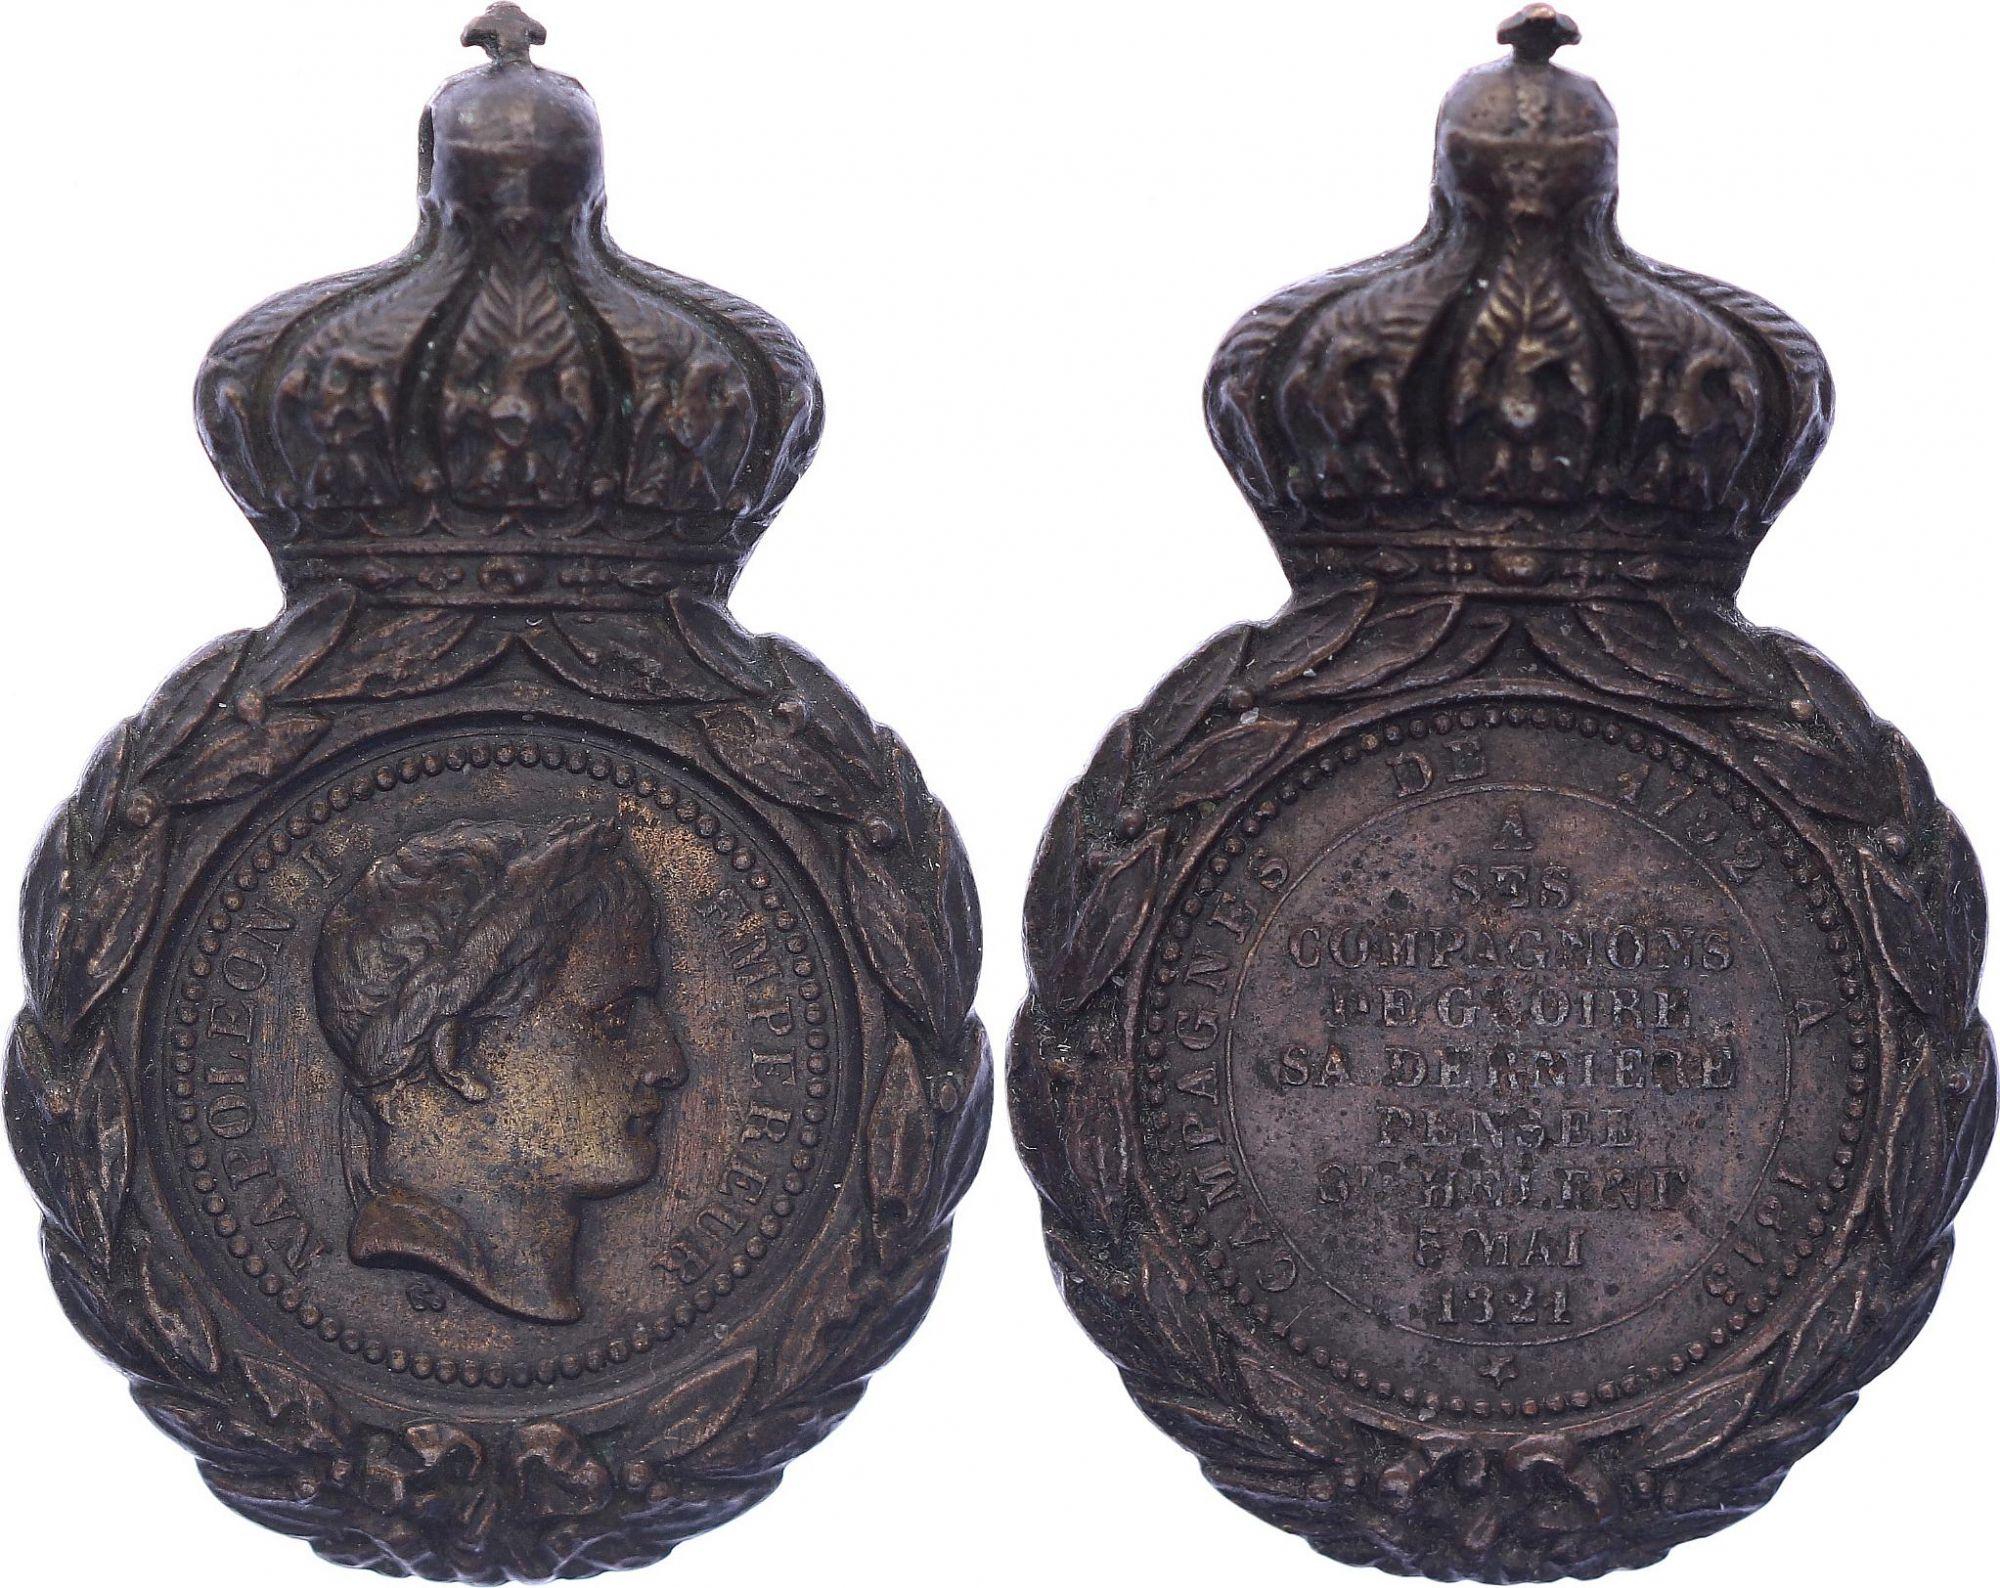 France Médaille de Sainte-Hélène - Napoléon I (1792-1815) - sans ruban ni fixation